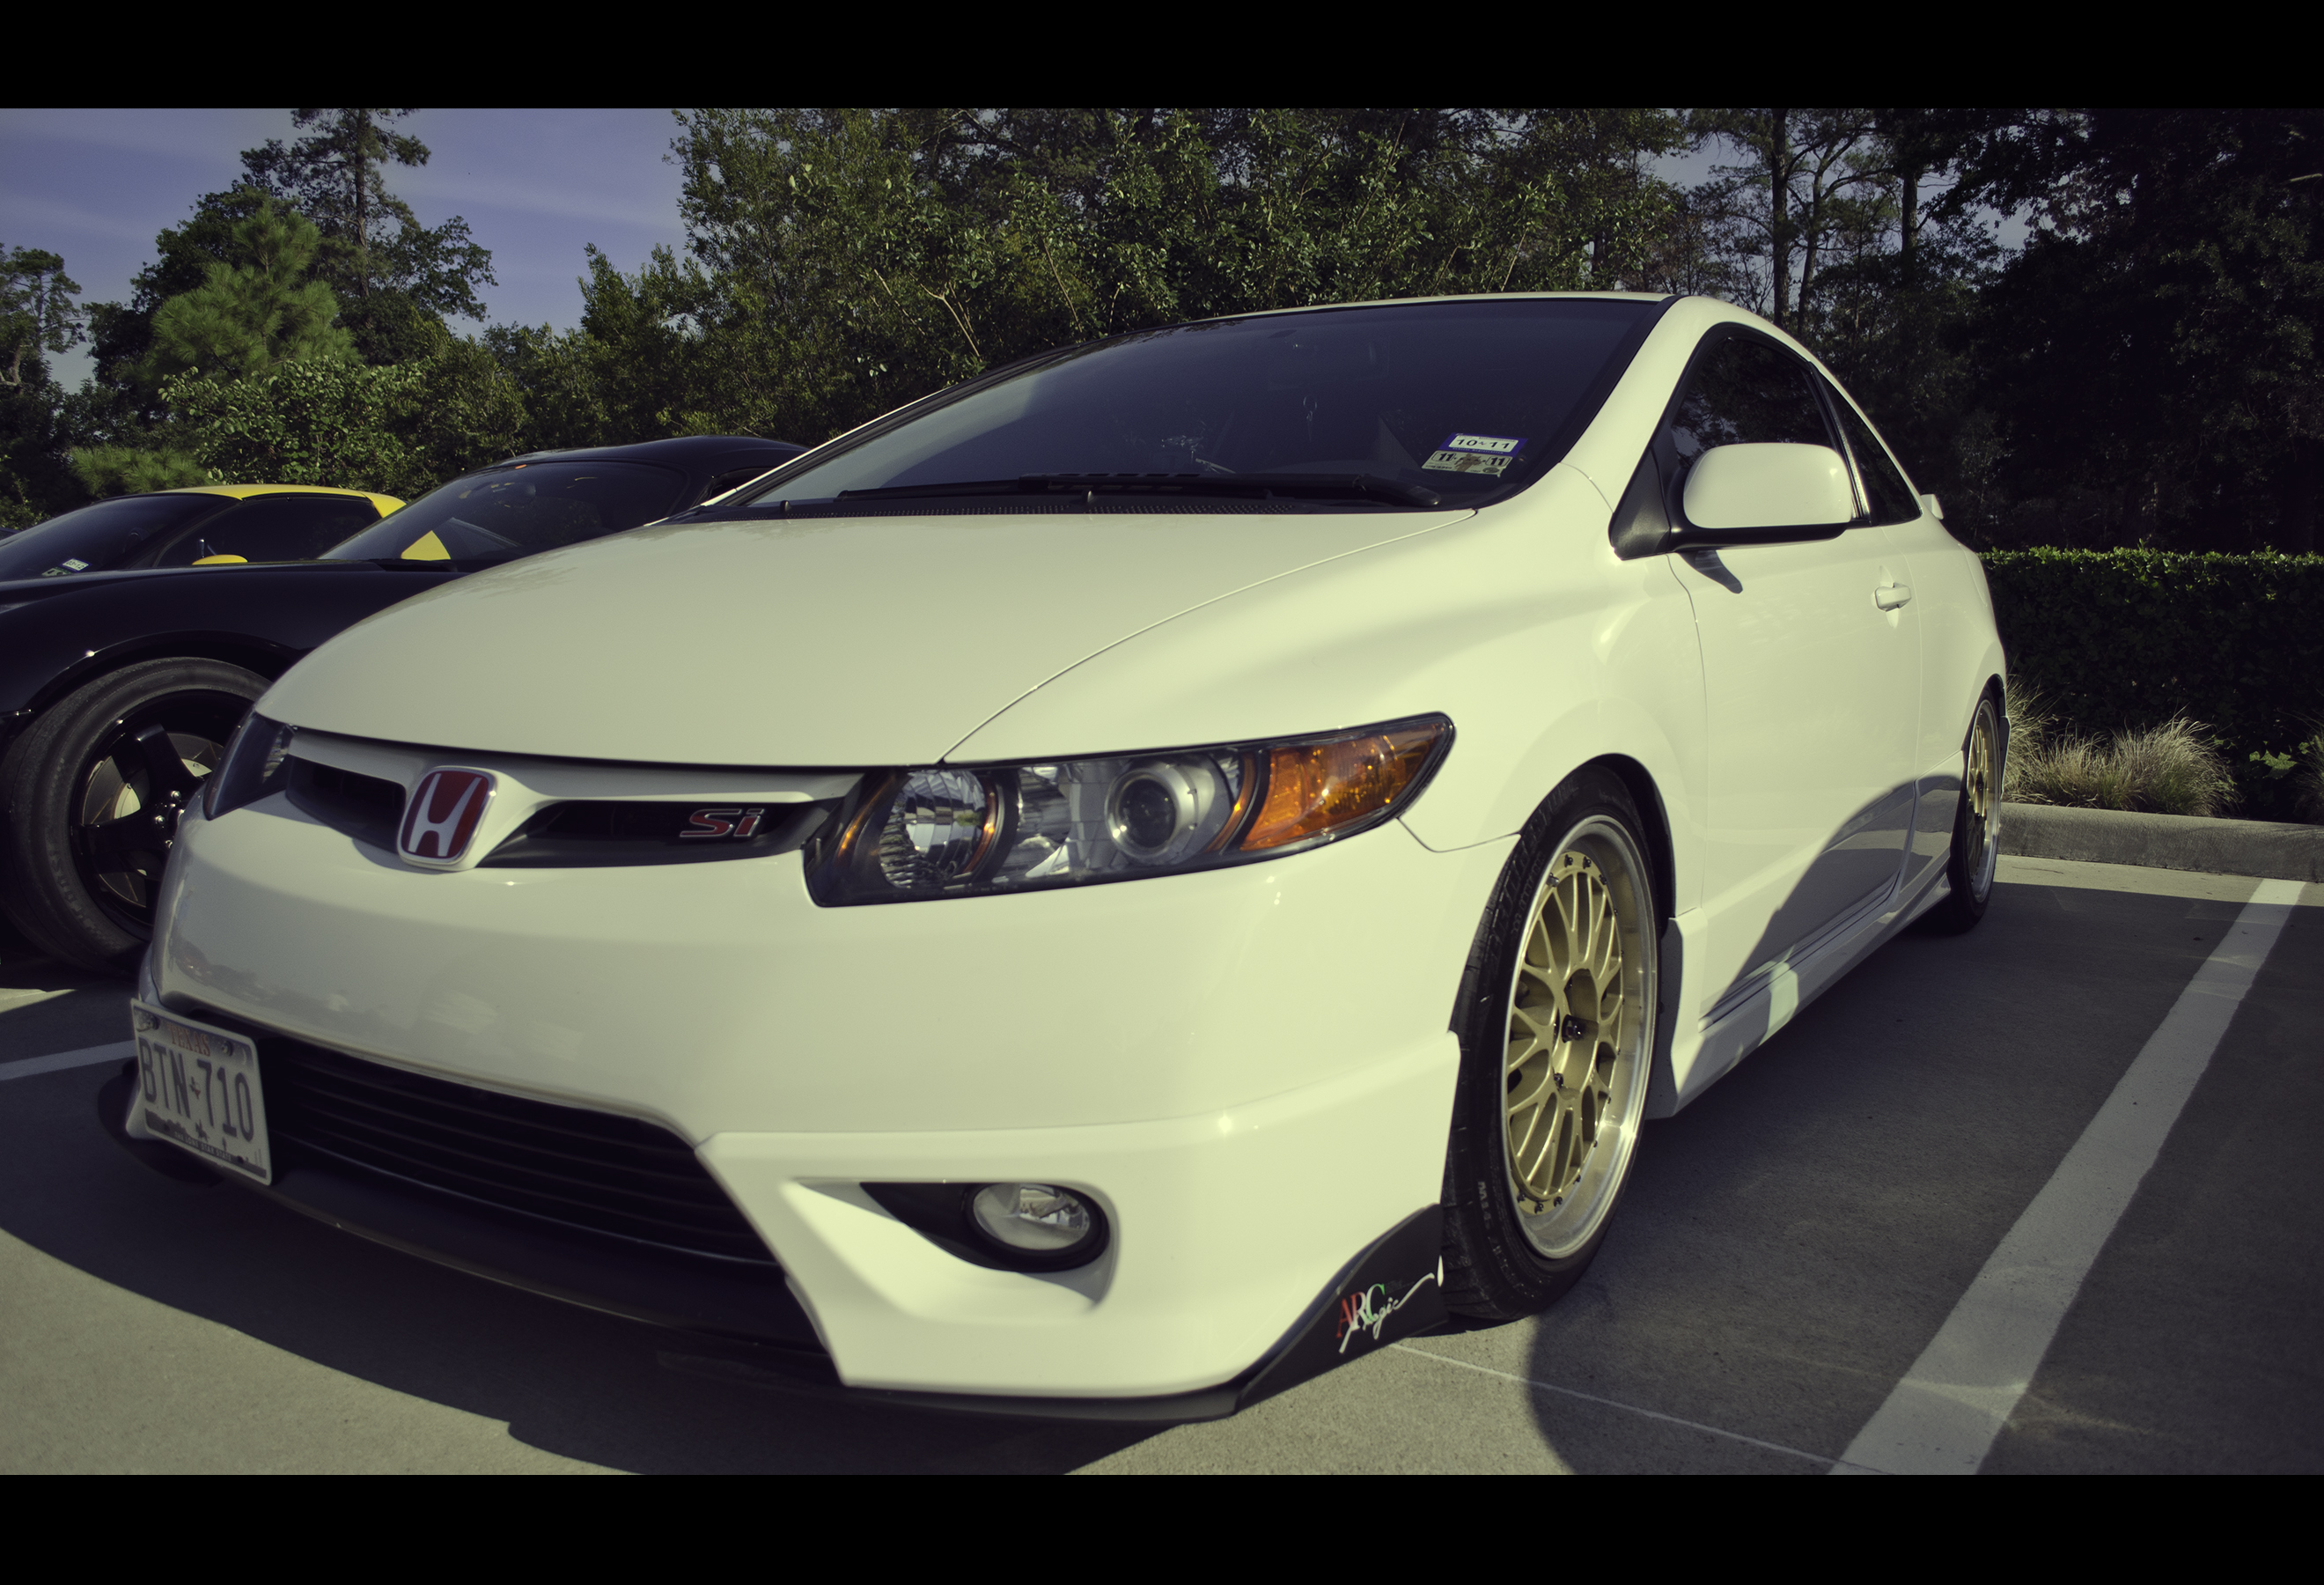 Image Result For Honda Civic Cars